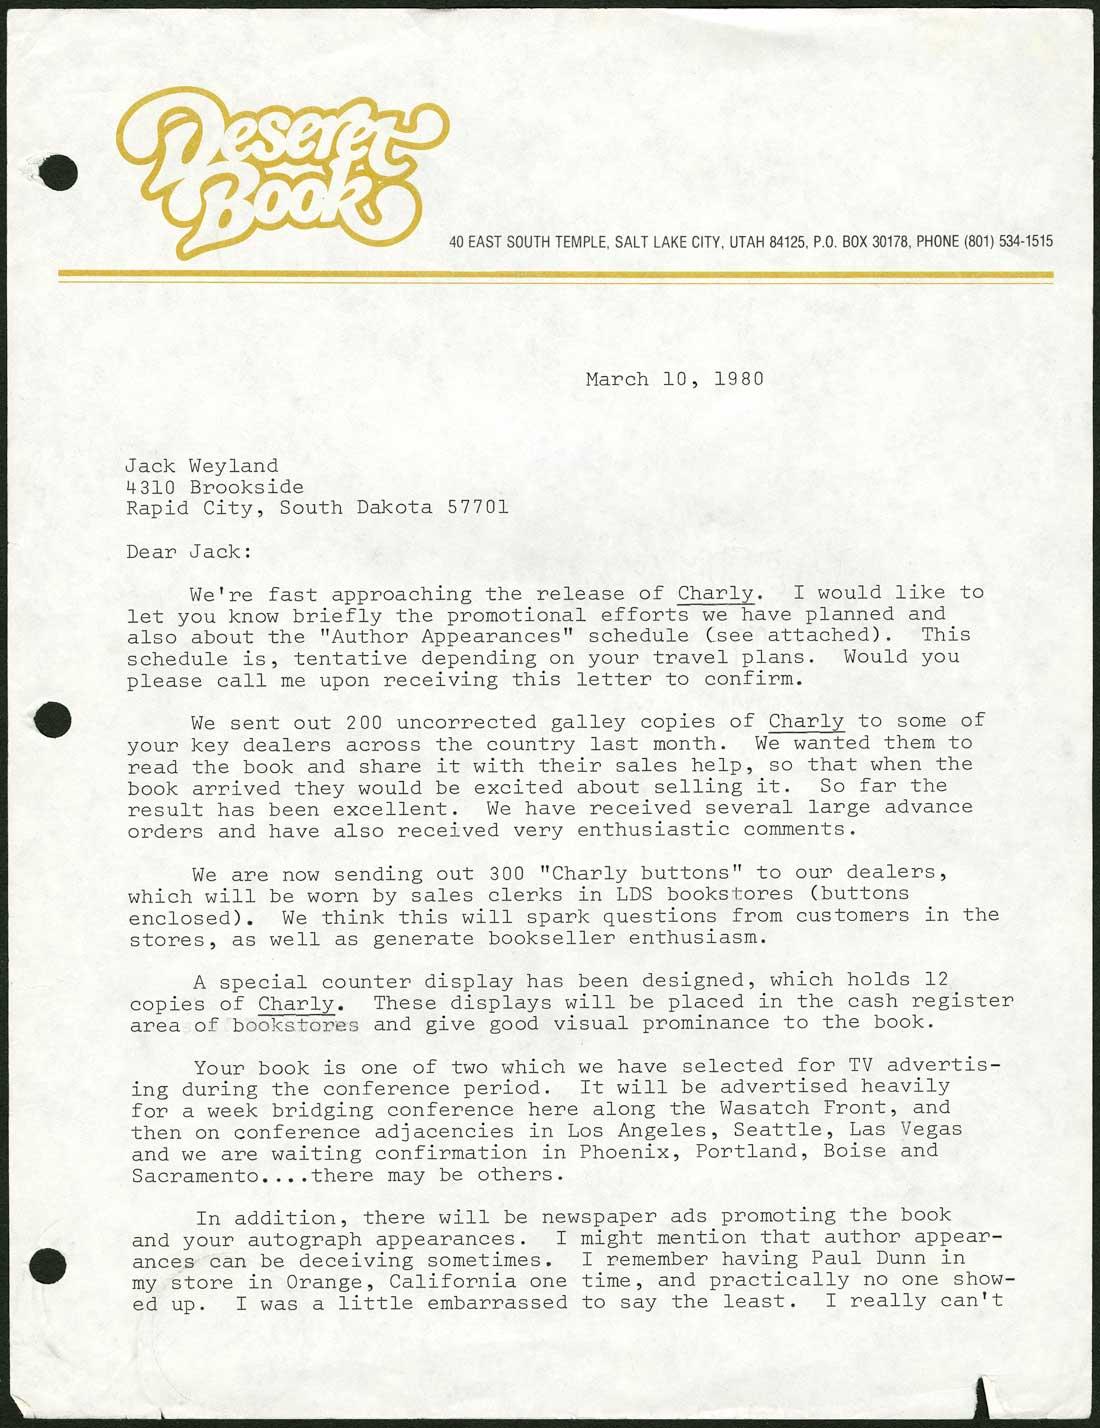 literary worlds > jack weyland letter from deseret book to jack weyland 10 1980